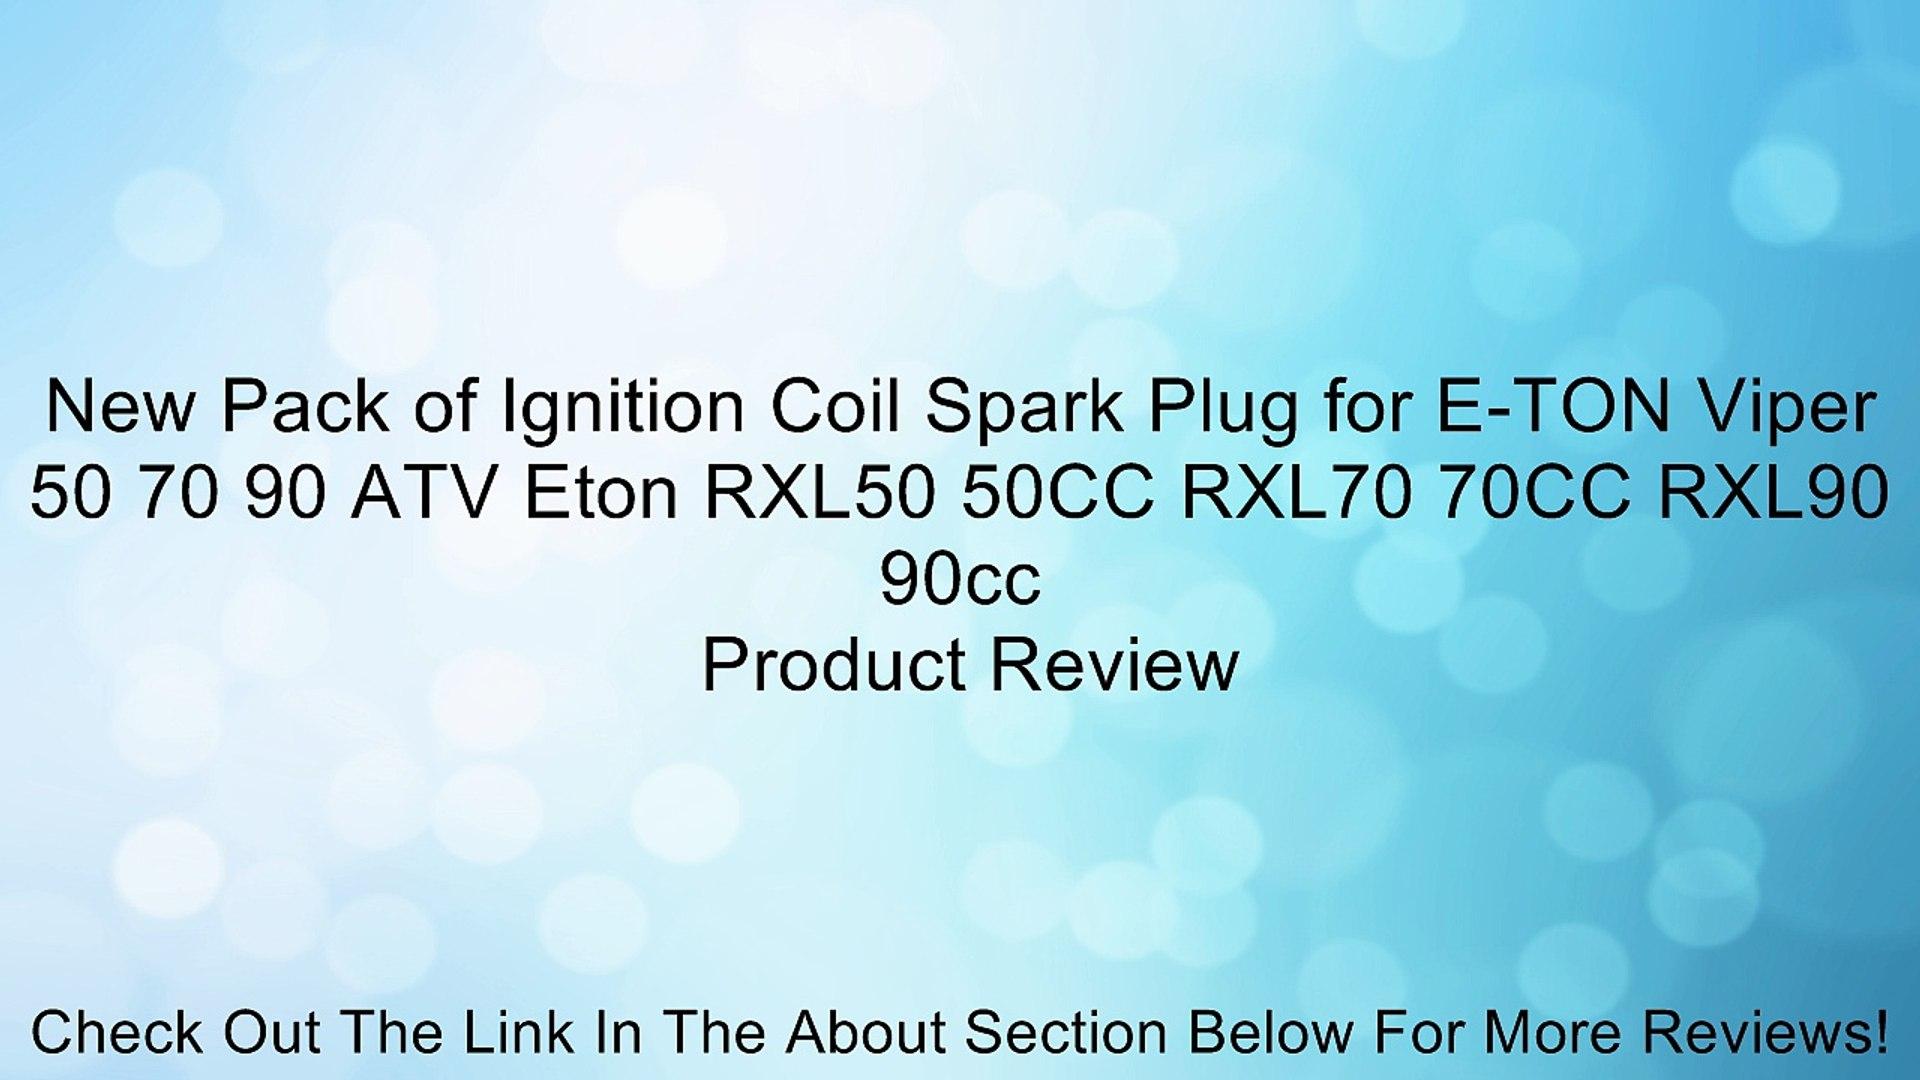 IGNITION COIL FOR  ETON VIPER 50 70 90 ATV E-TON RXL50 RXL70 RXL90